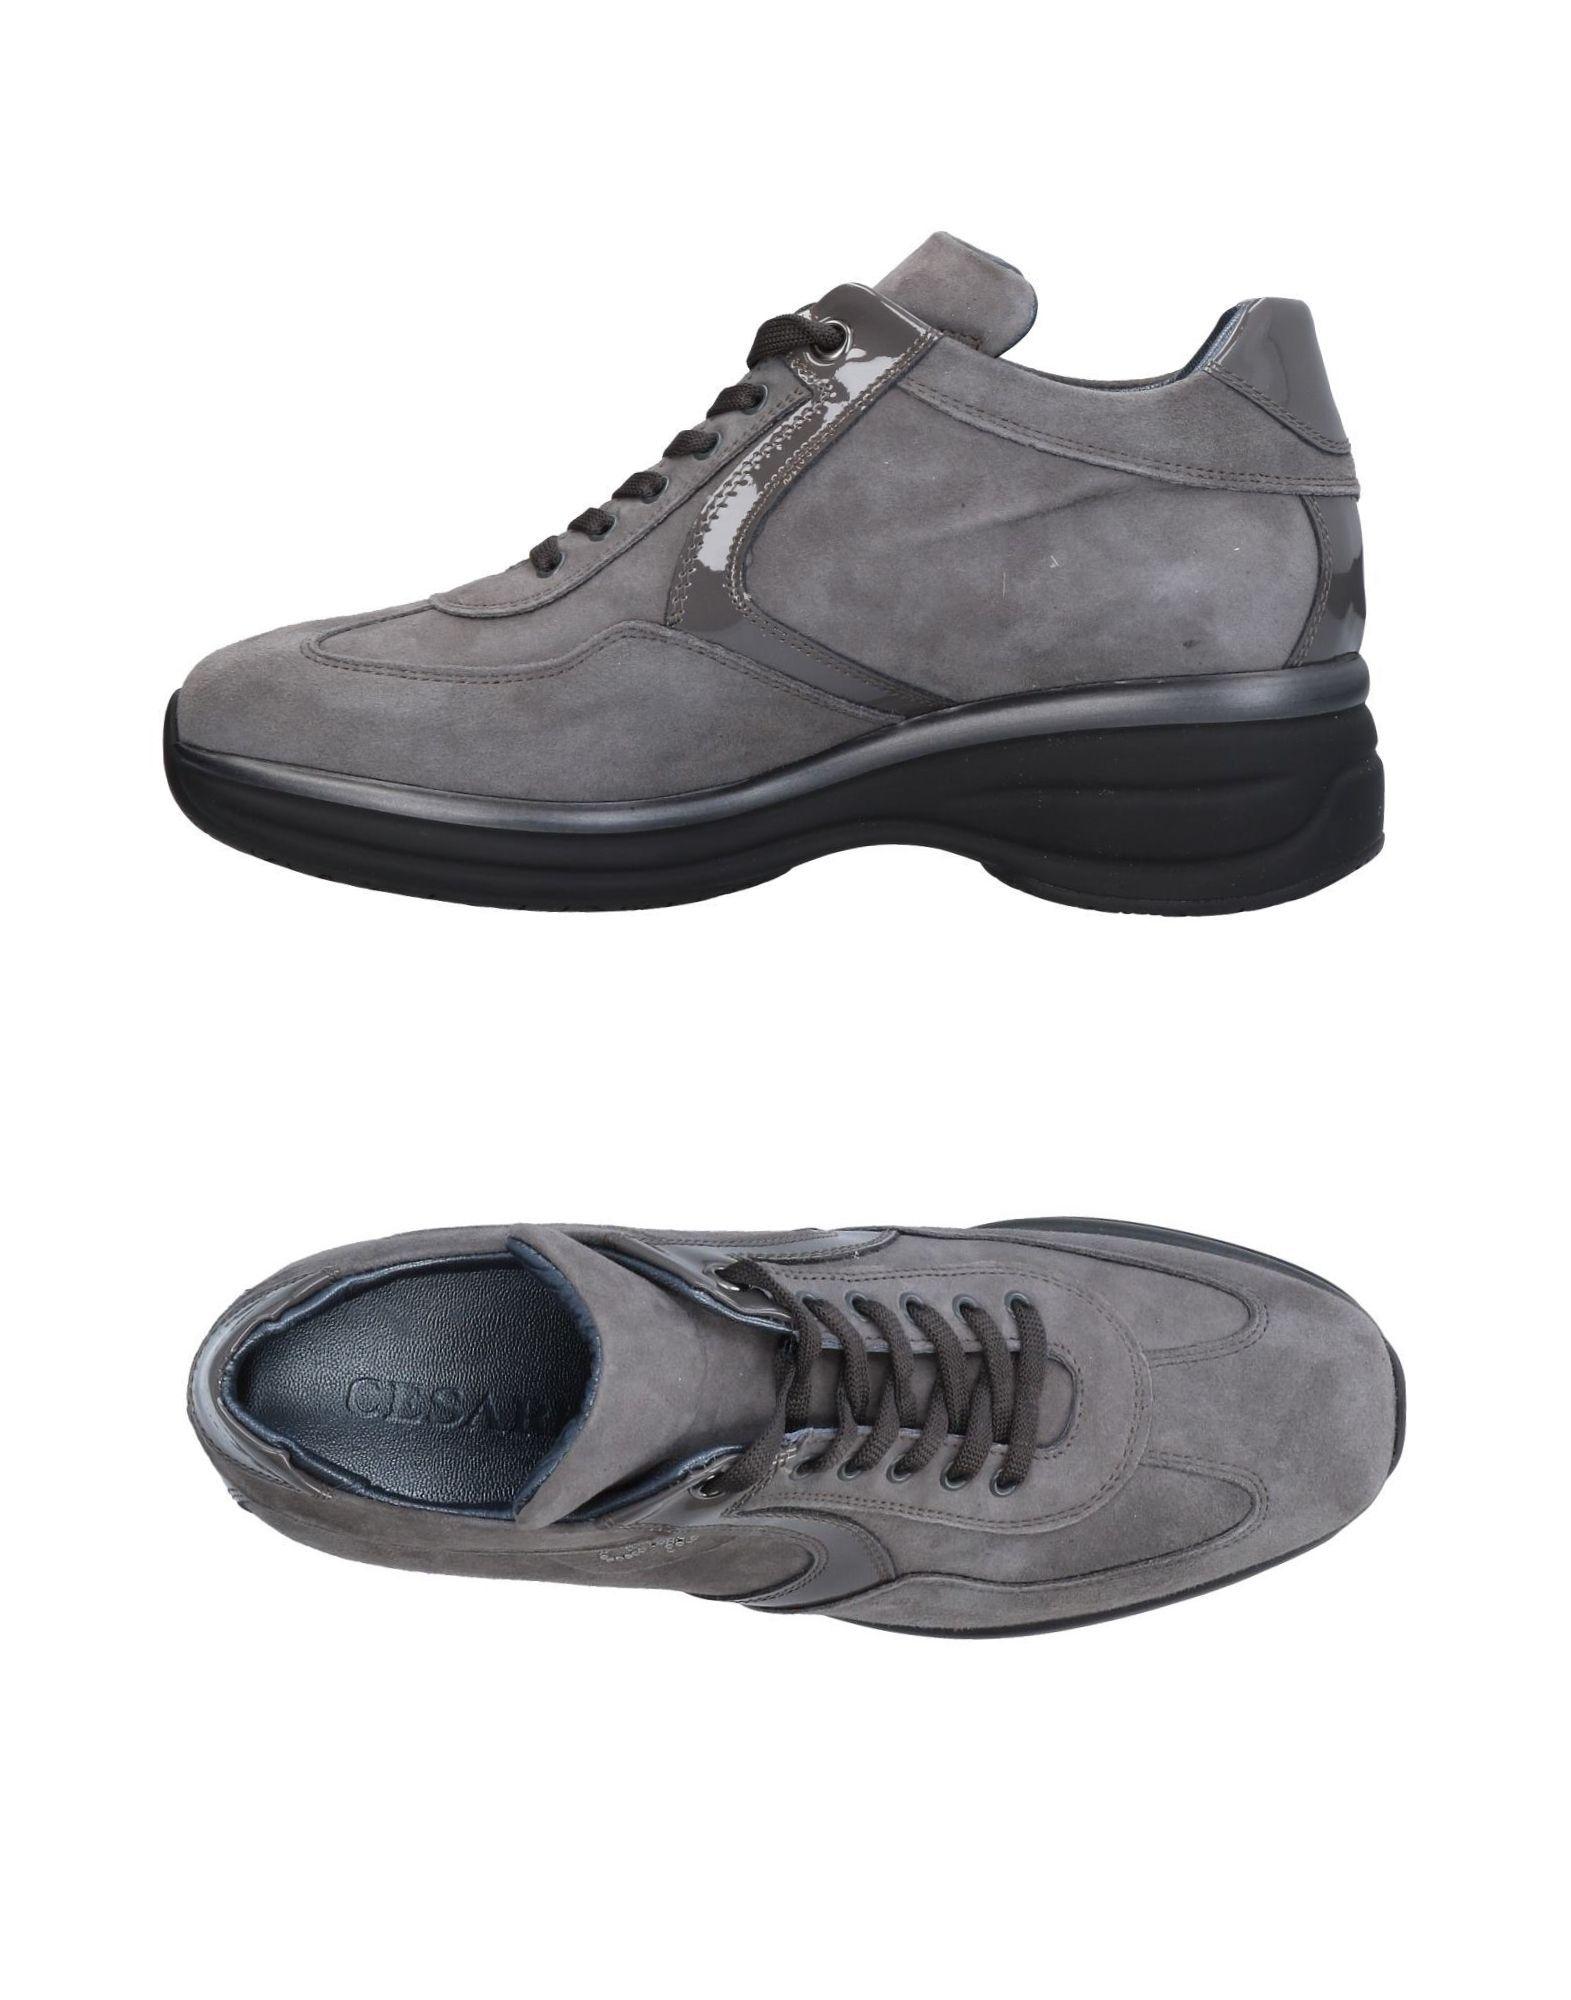 Cesare P. Sneakers Damen  11459954NHGut aussehende strapazierfähige Schuhe